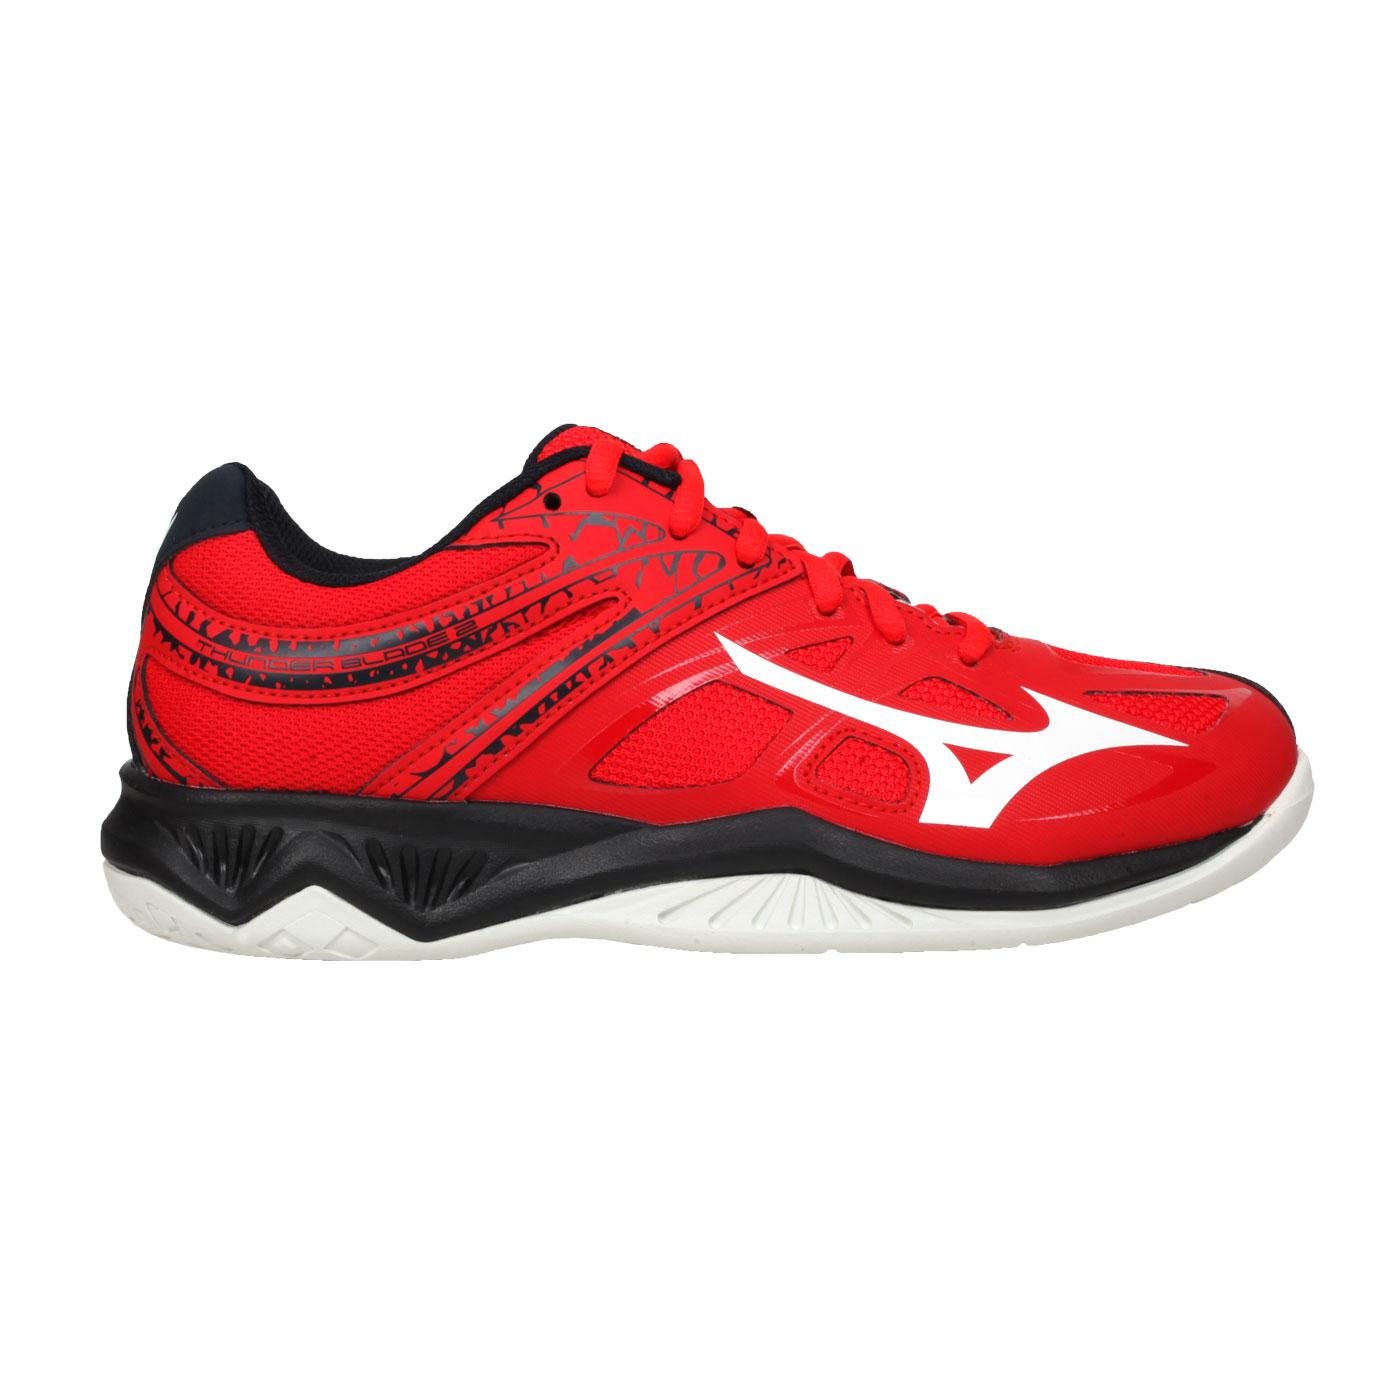 MIZUNO 排球鞋  @THUNDER BLADE 2@V1GA197063